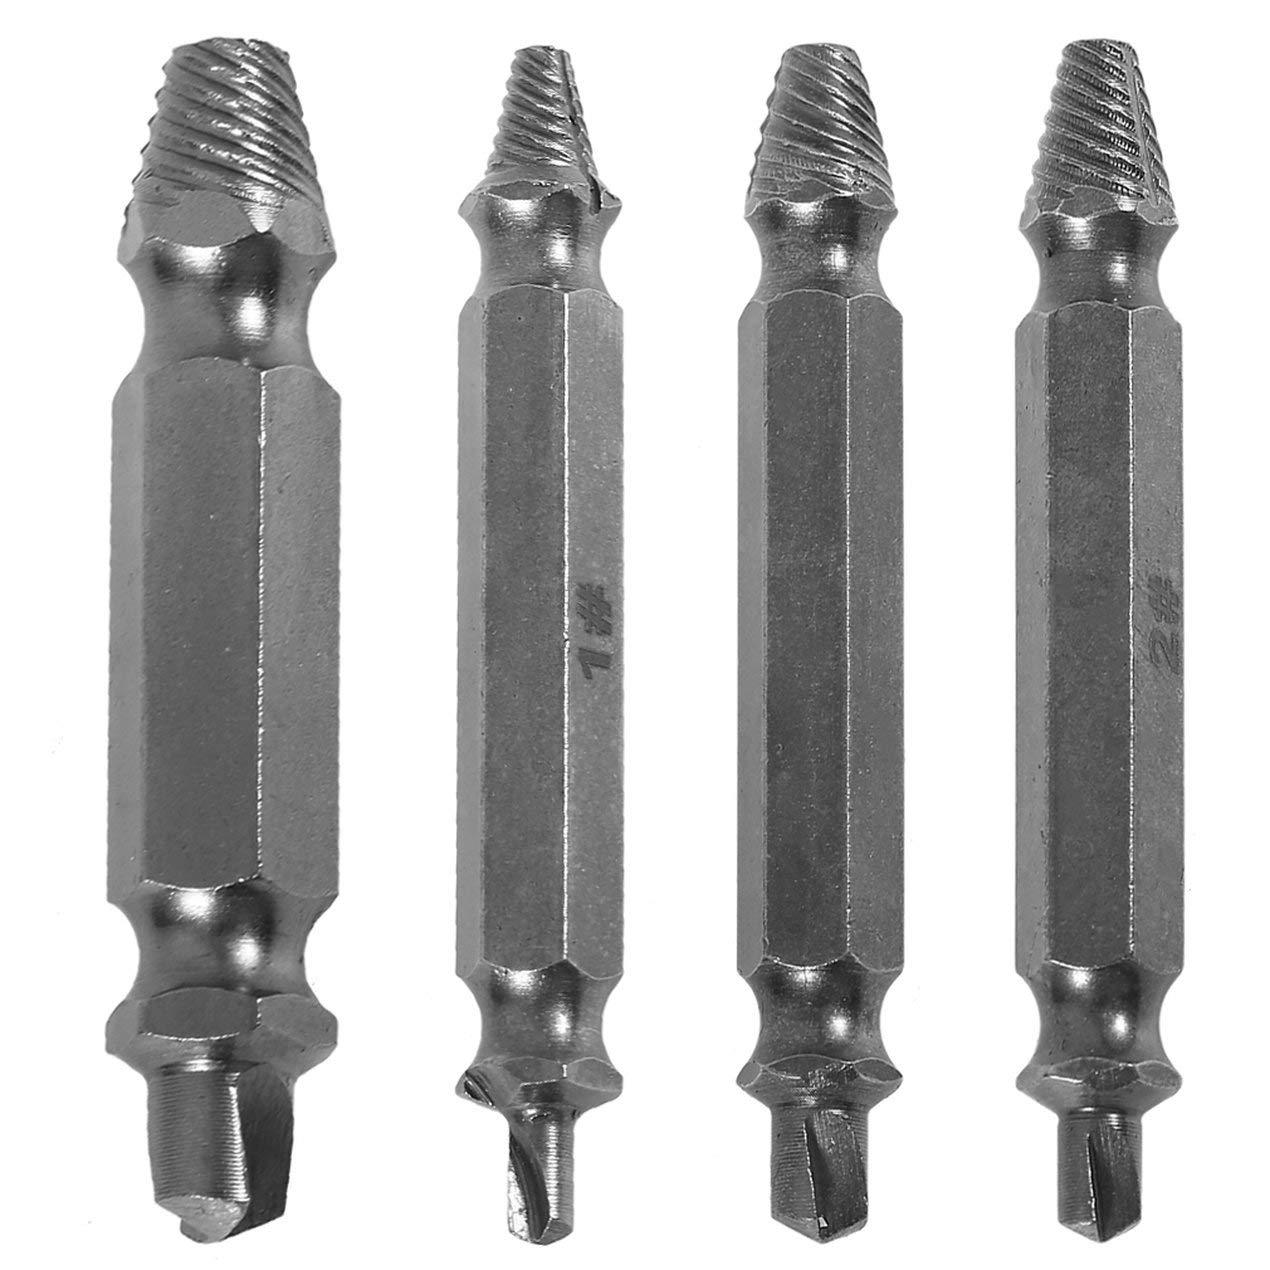 JullyCAnnice Professional 4pcs//set Steel Broken Screws Extractor Broken Bolt Remover Easy Out Set Drill Bits Guide Set